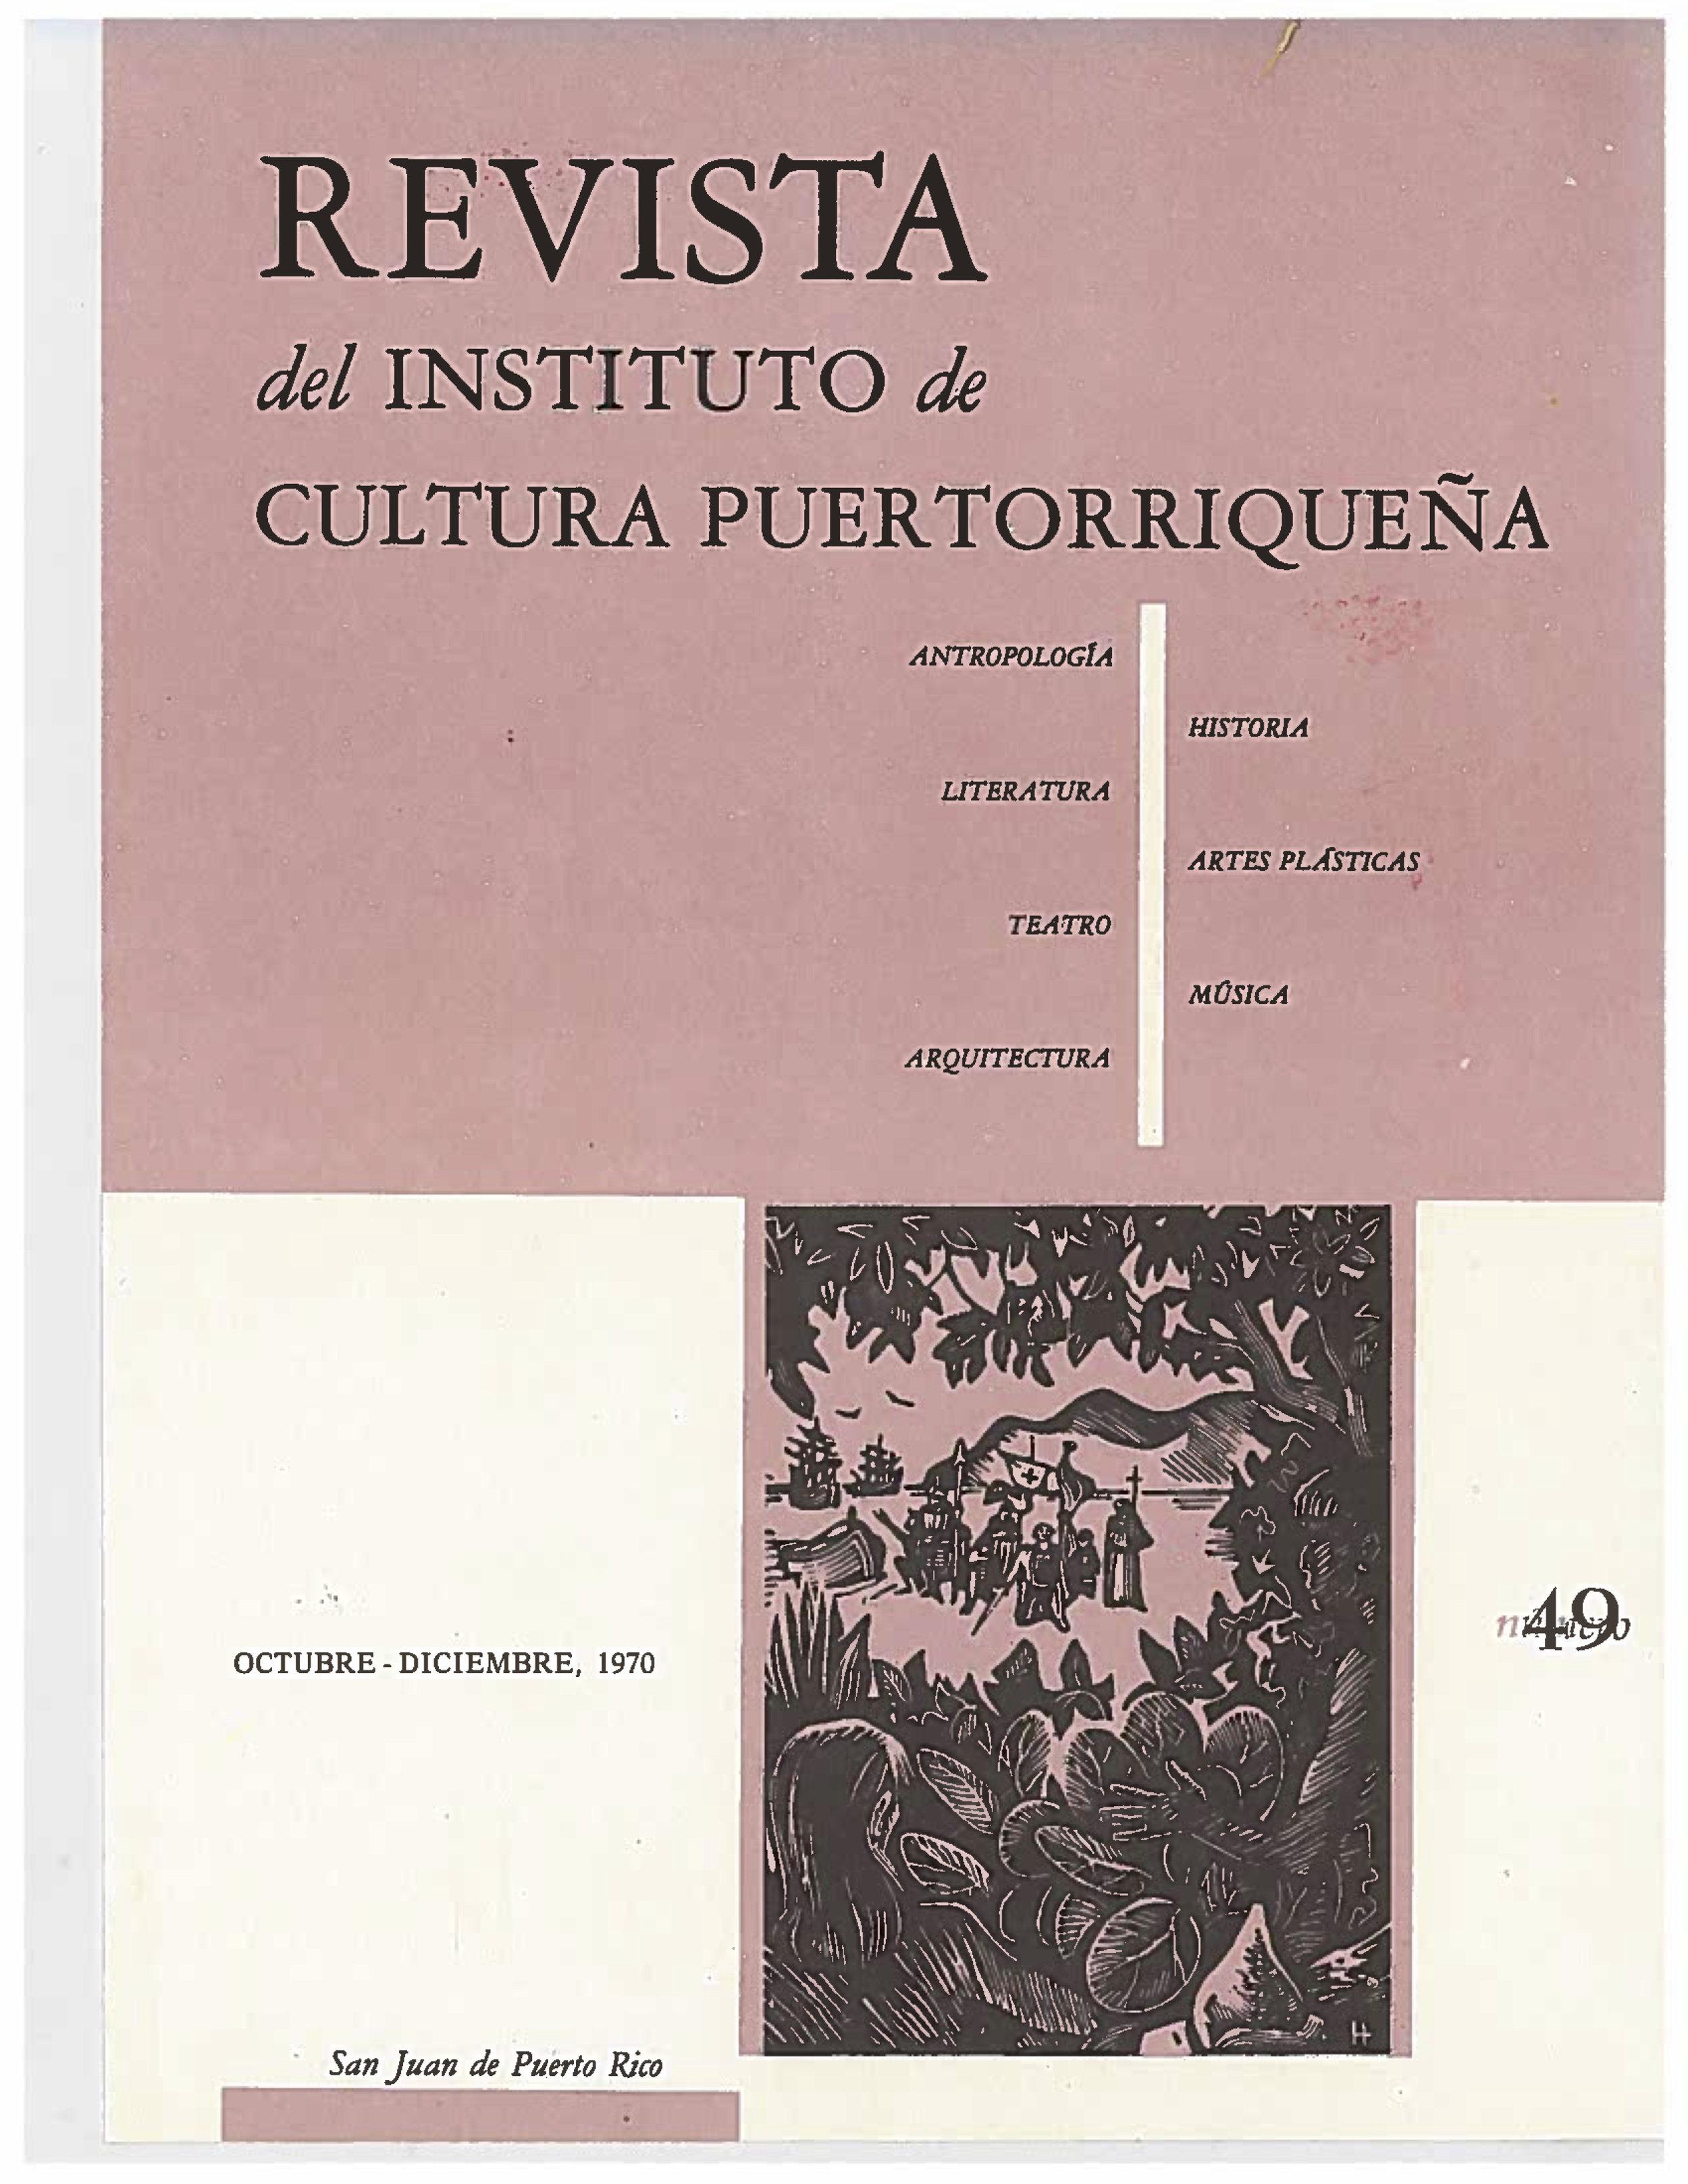 Número 49 / 1970